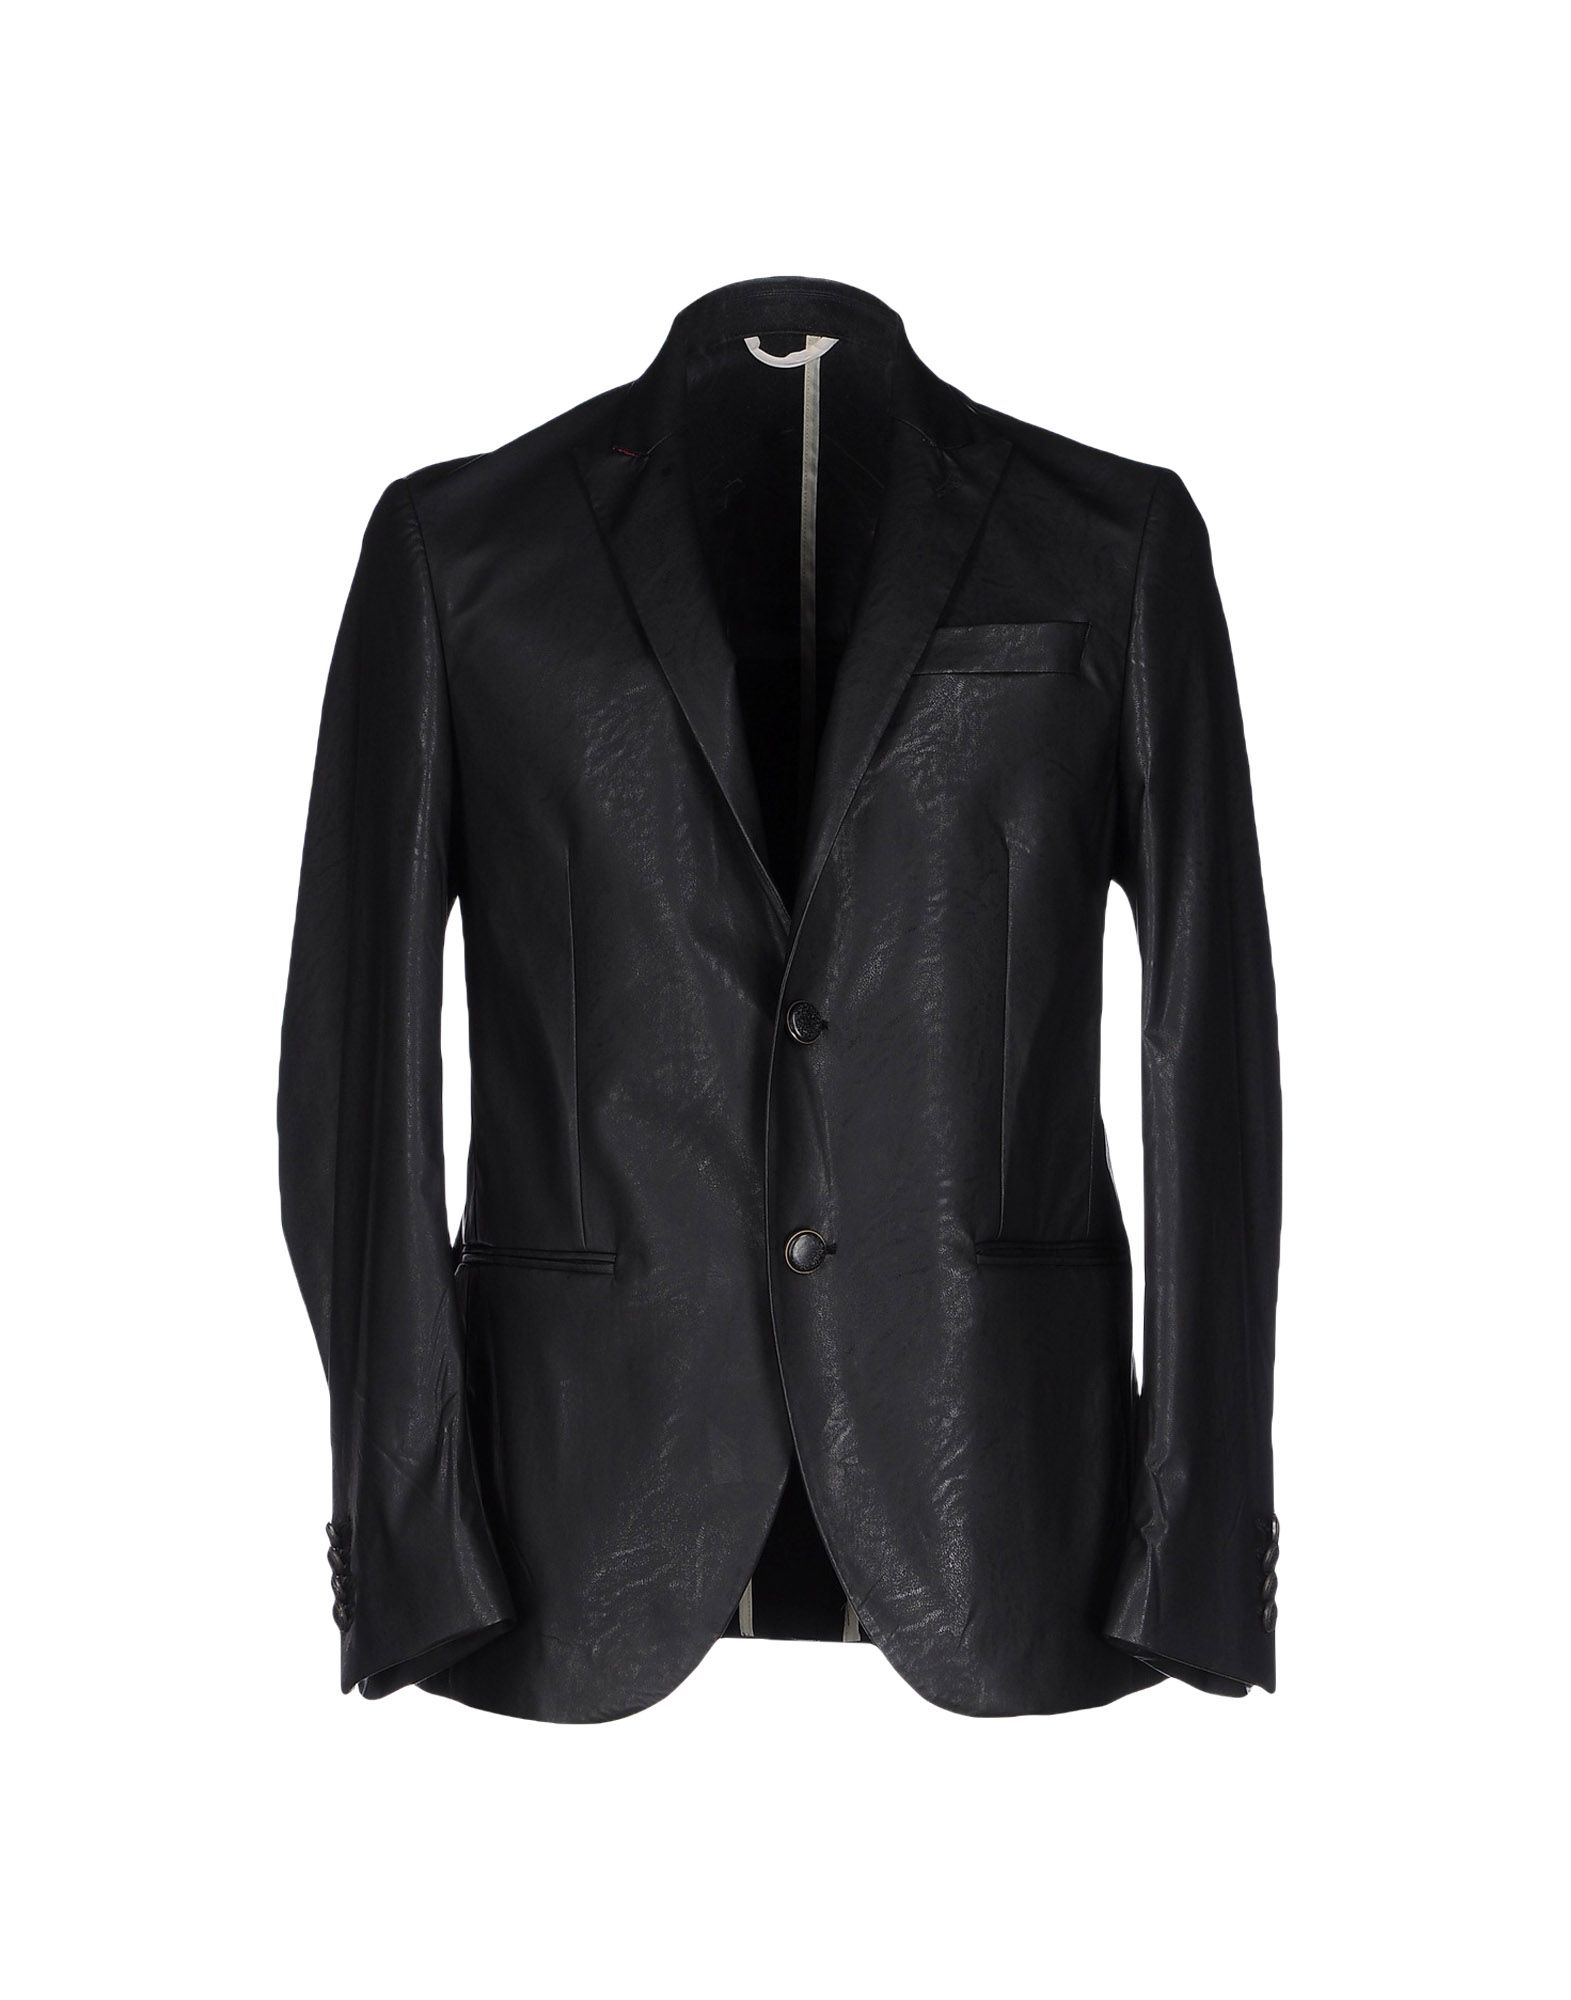 MAISON LVCHINO Blazer in Black